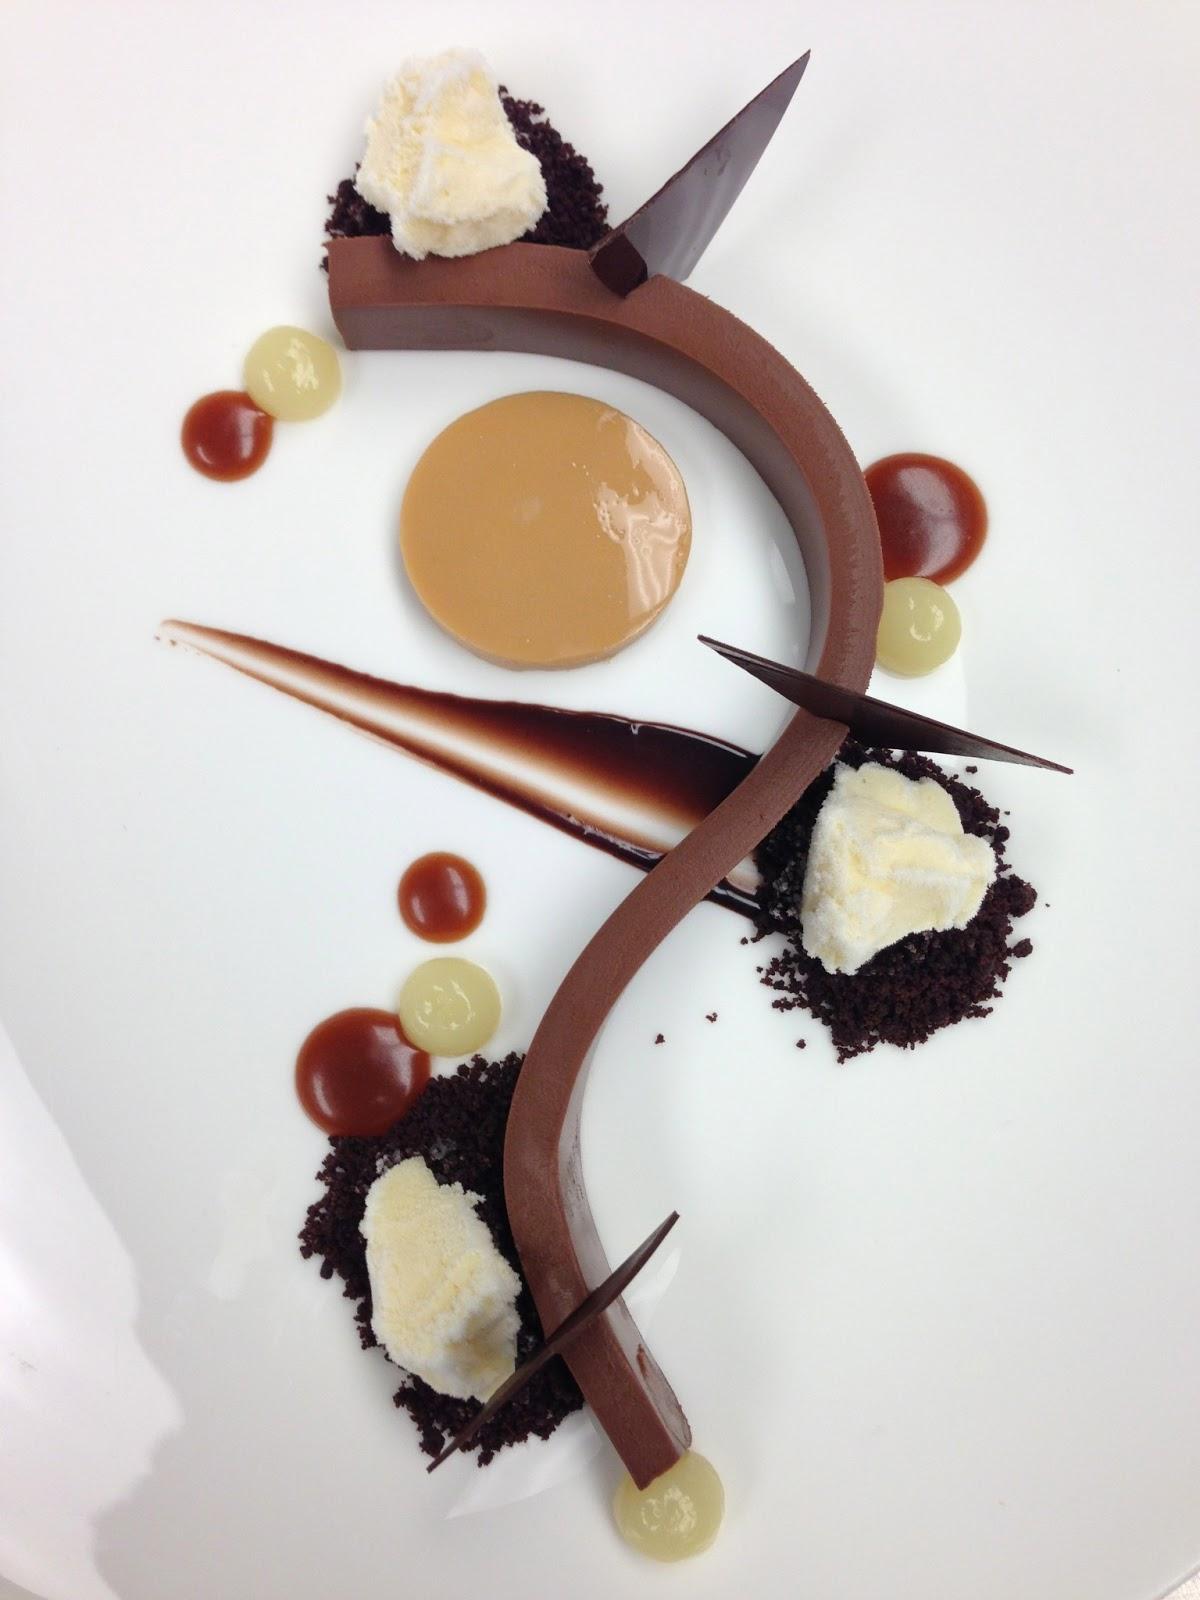 Cake Art Modeling Chocolate : Modern Pastry: New Desserts